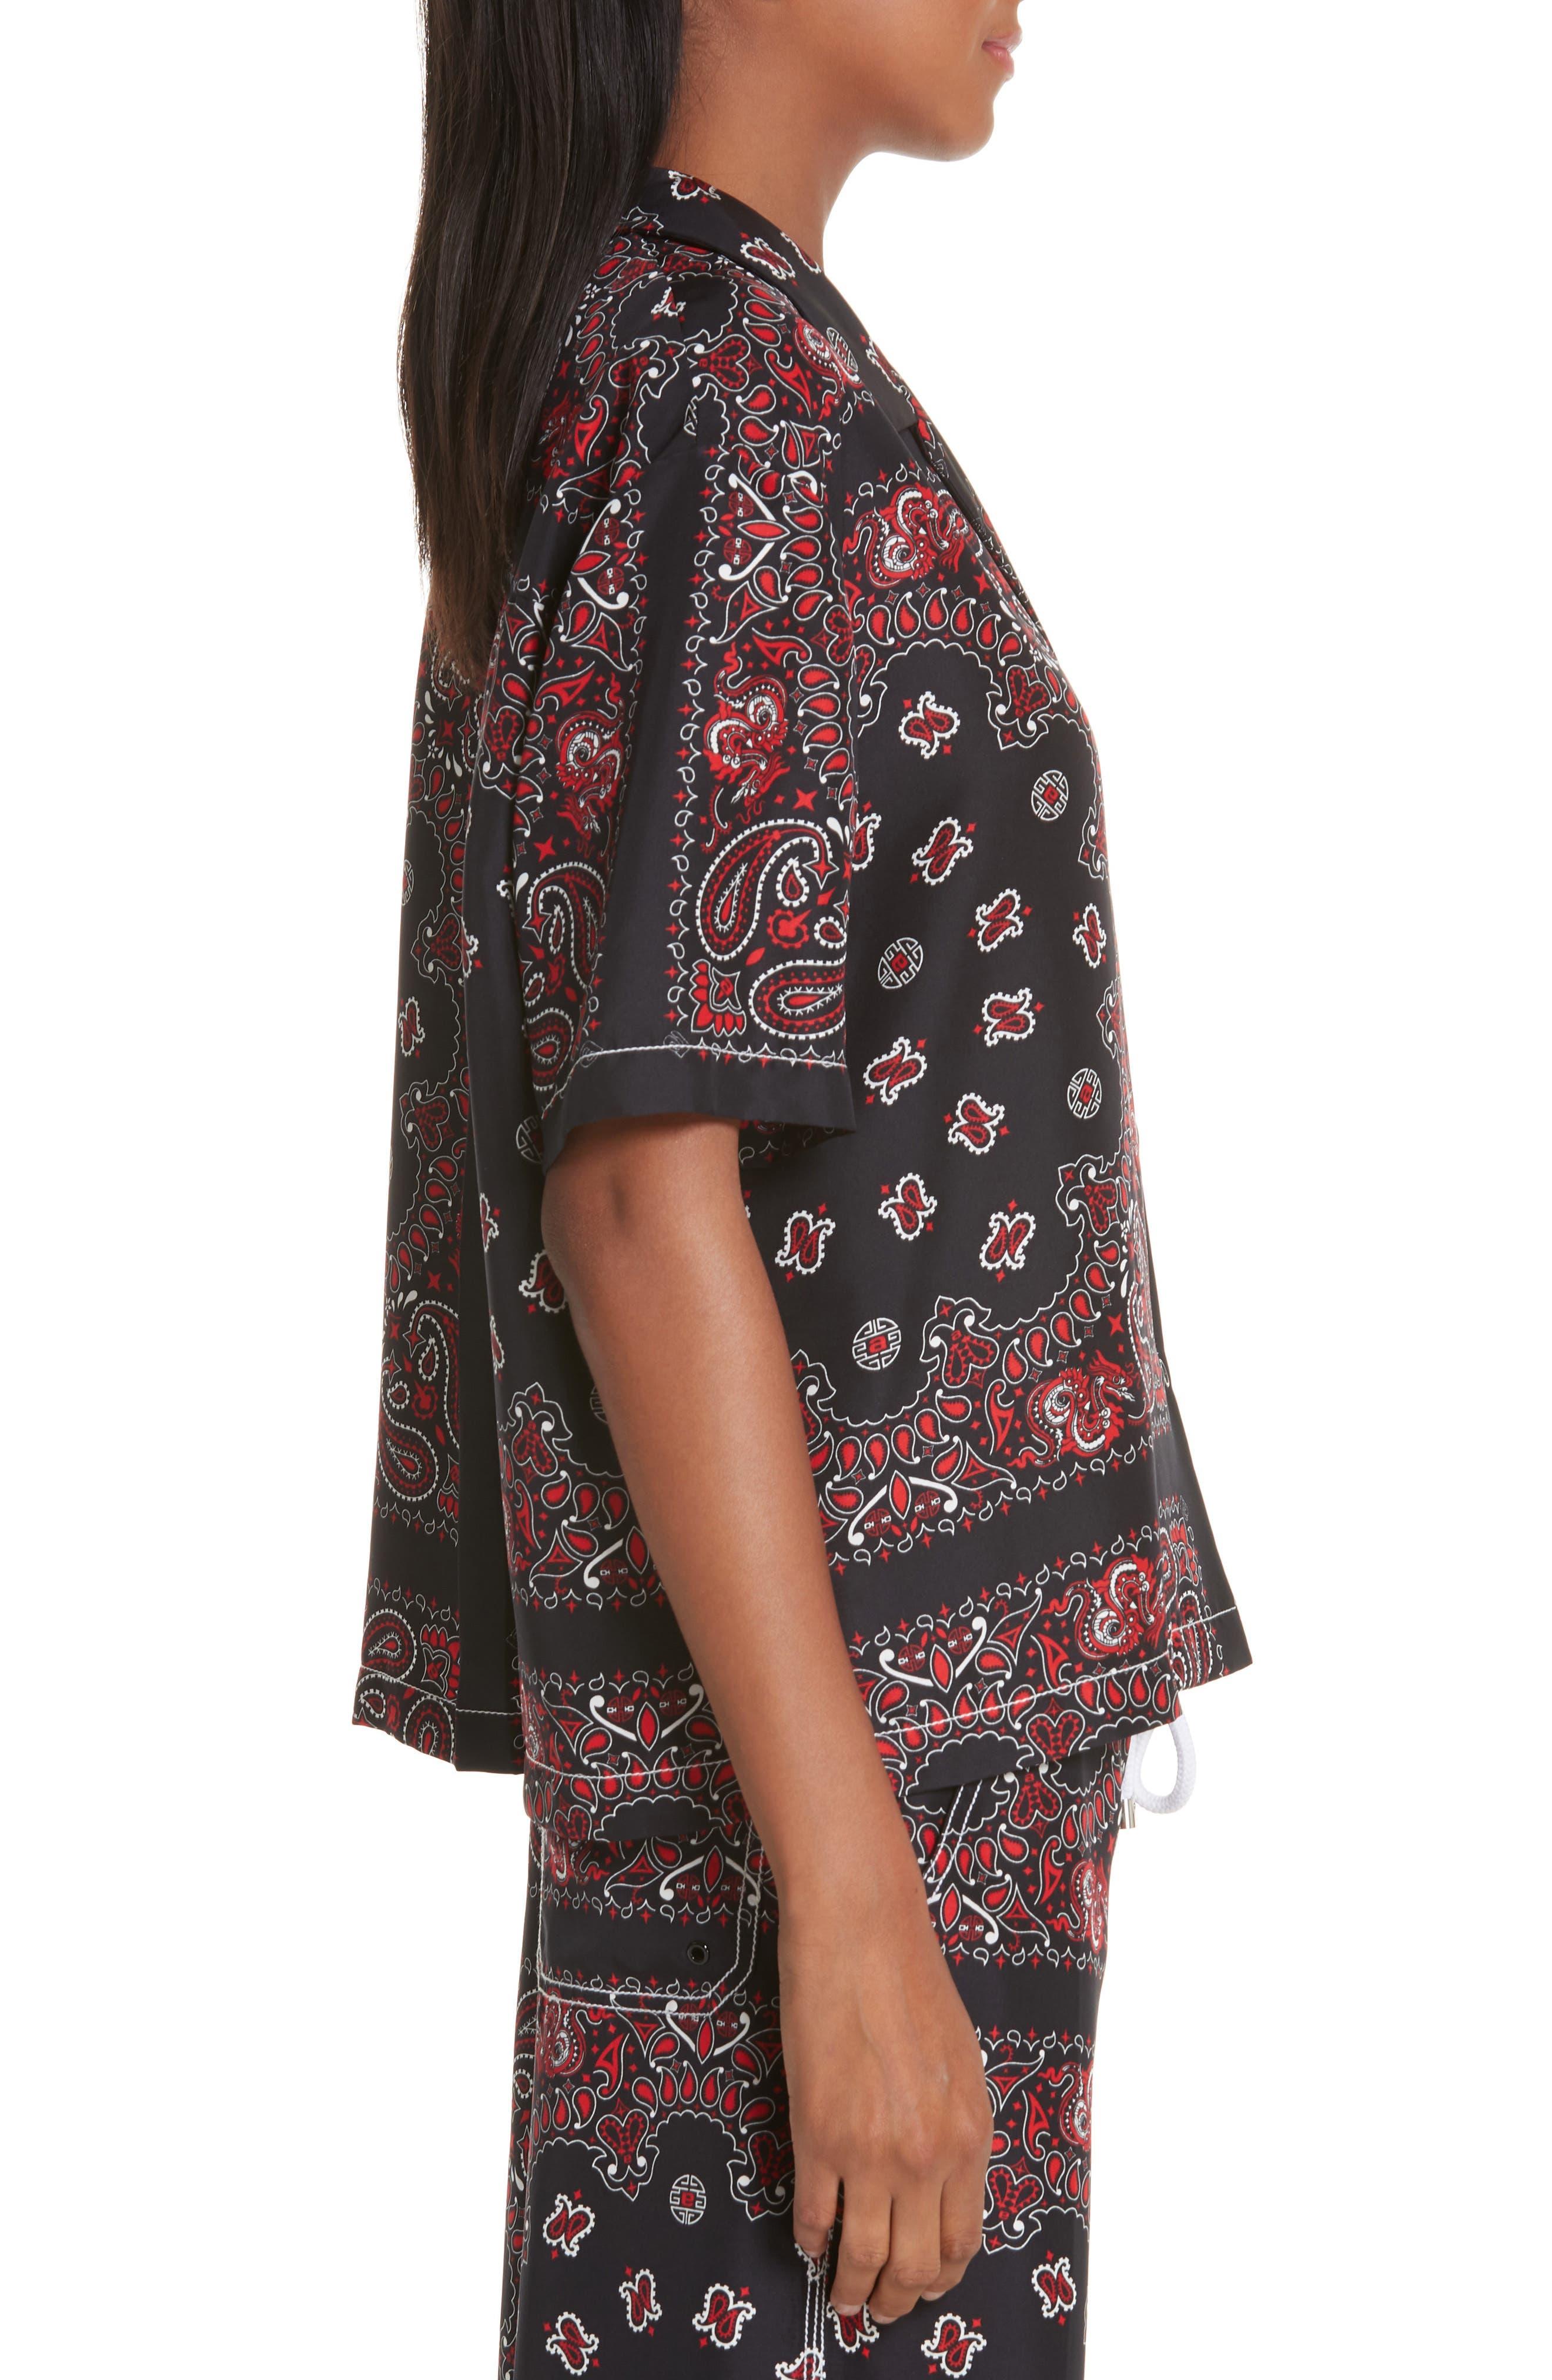 ALEXANDER WANG,                             Bandana Print Silk Shirt,                             Alternate thumbnail 4, color,                             BLACK/ RED